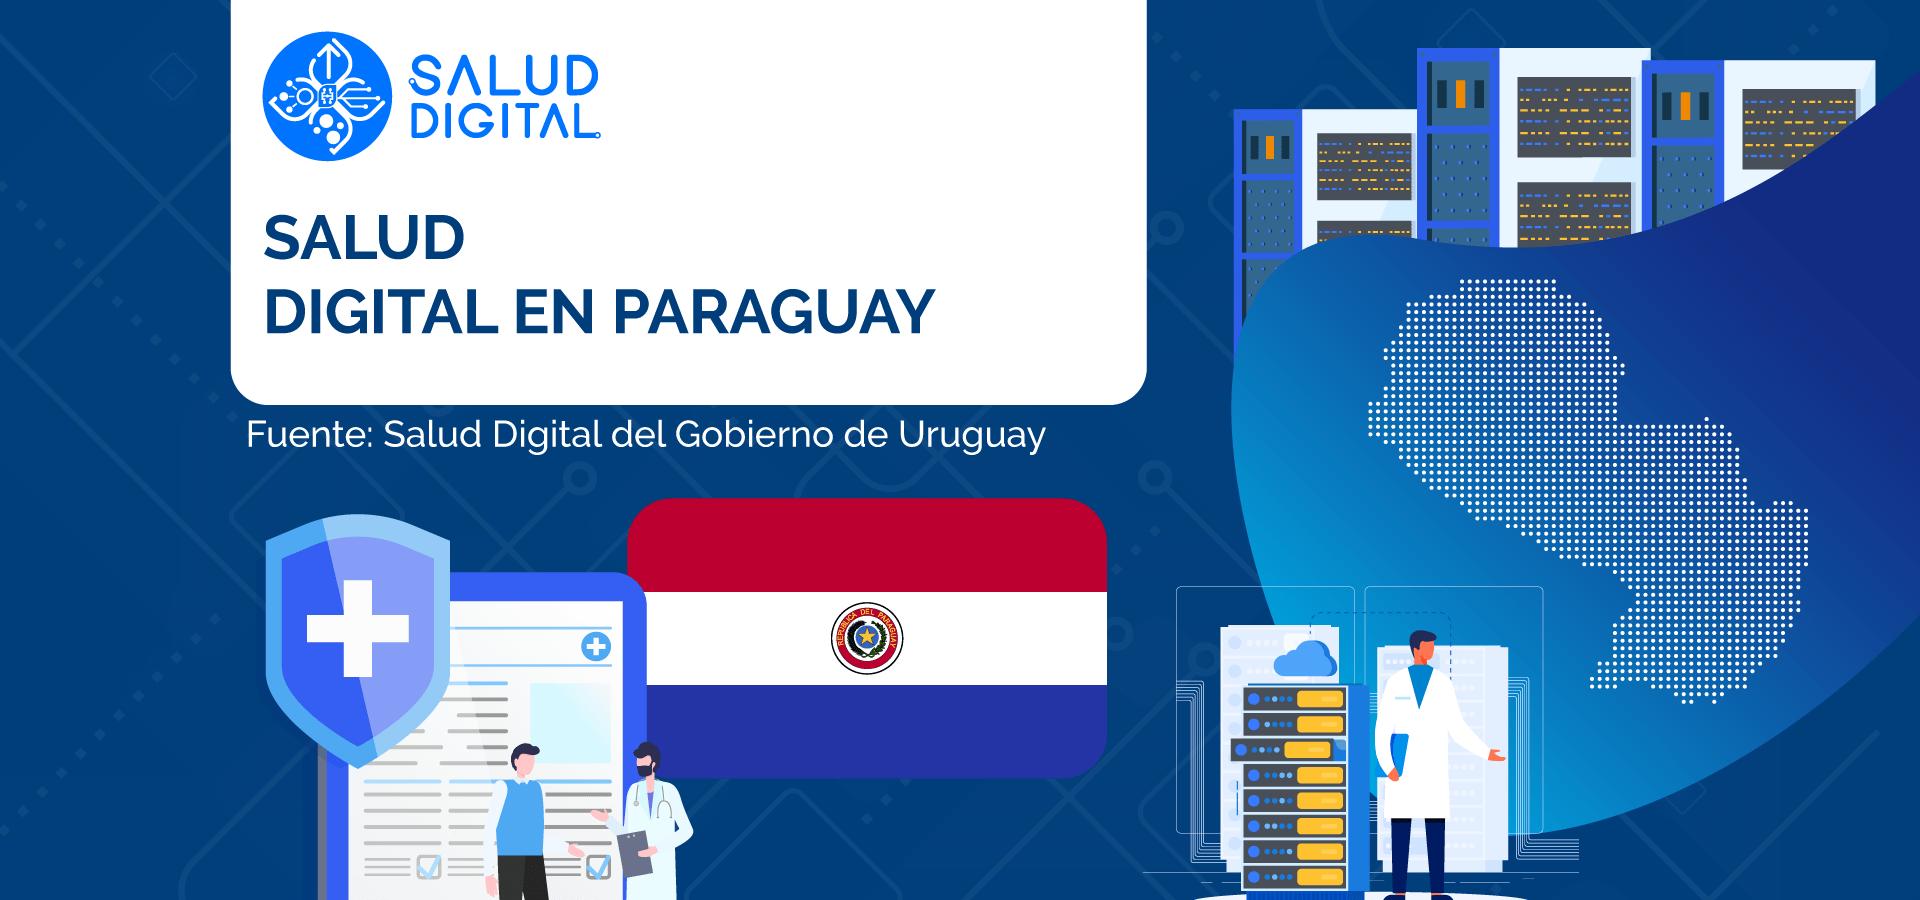 Salud-Digital-en-Paraguay-1920X900